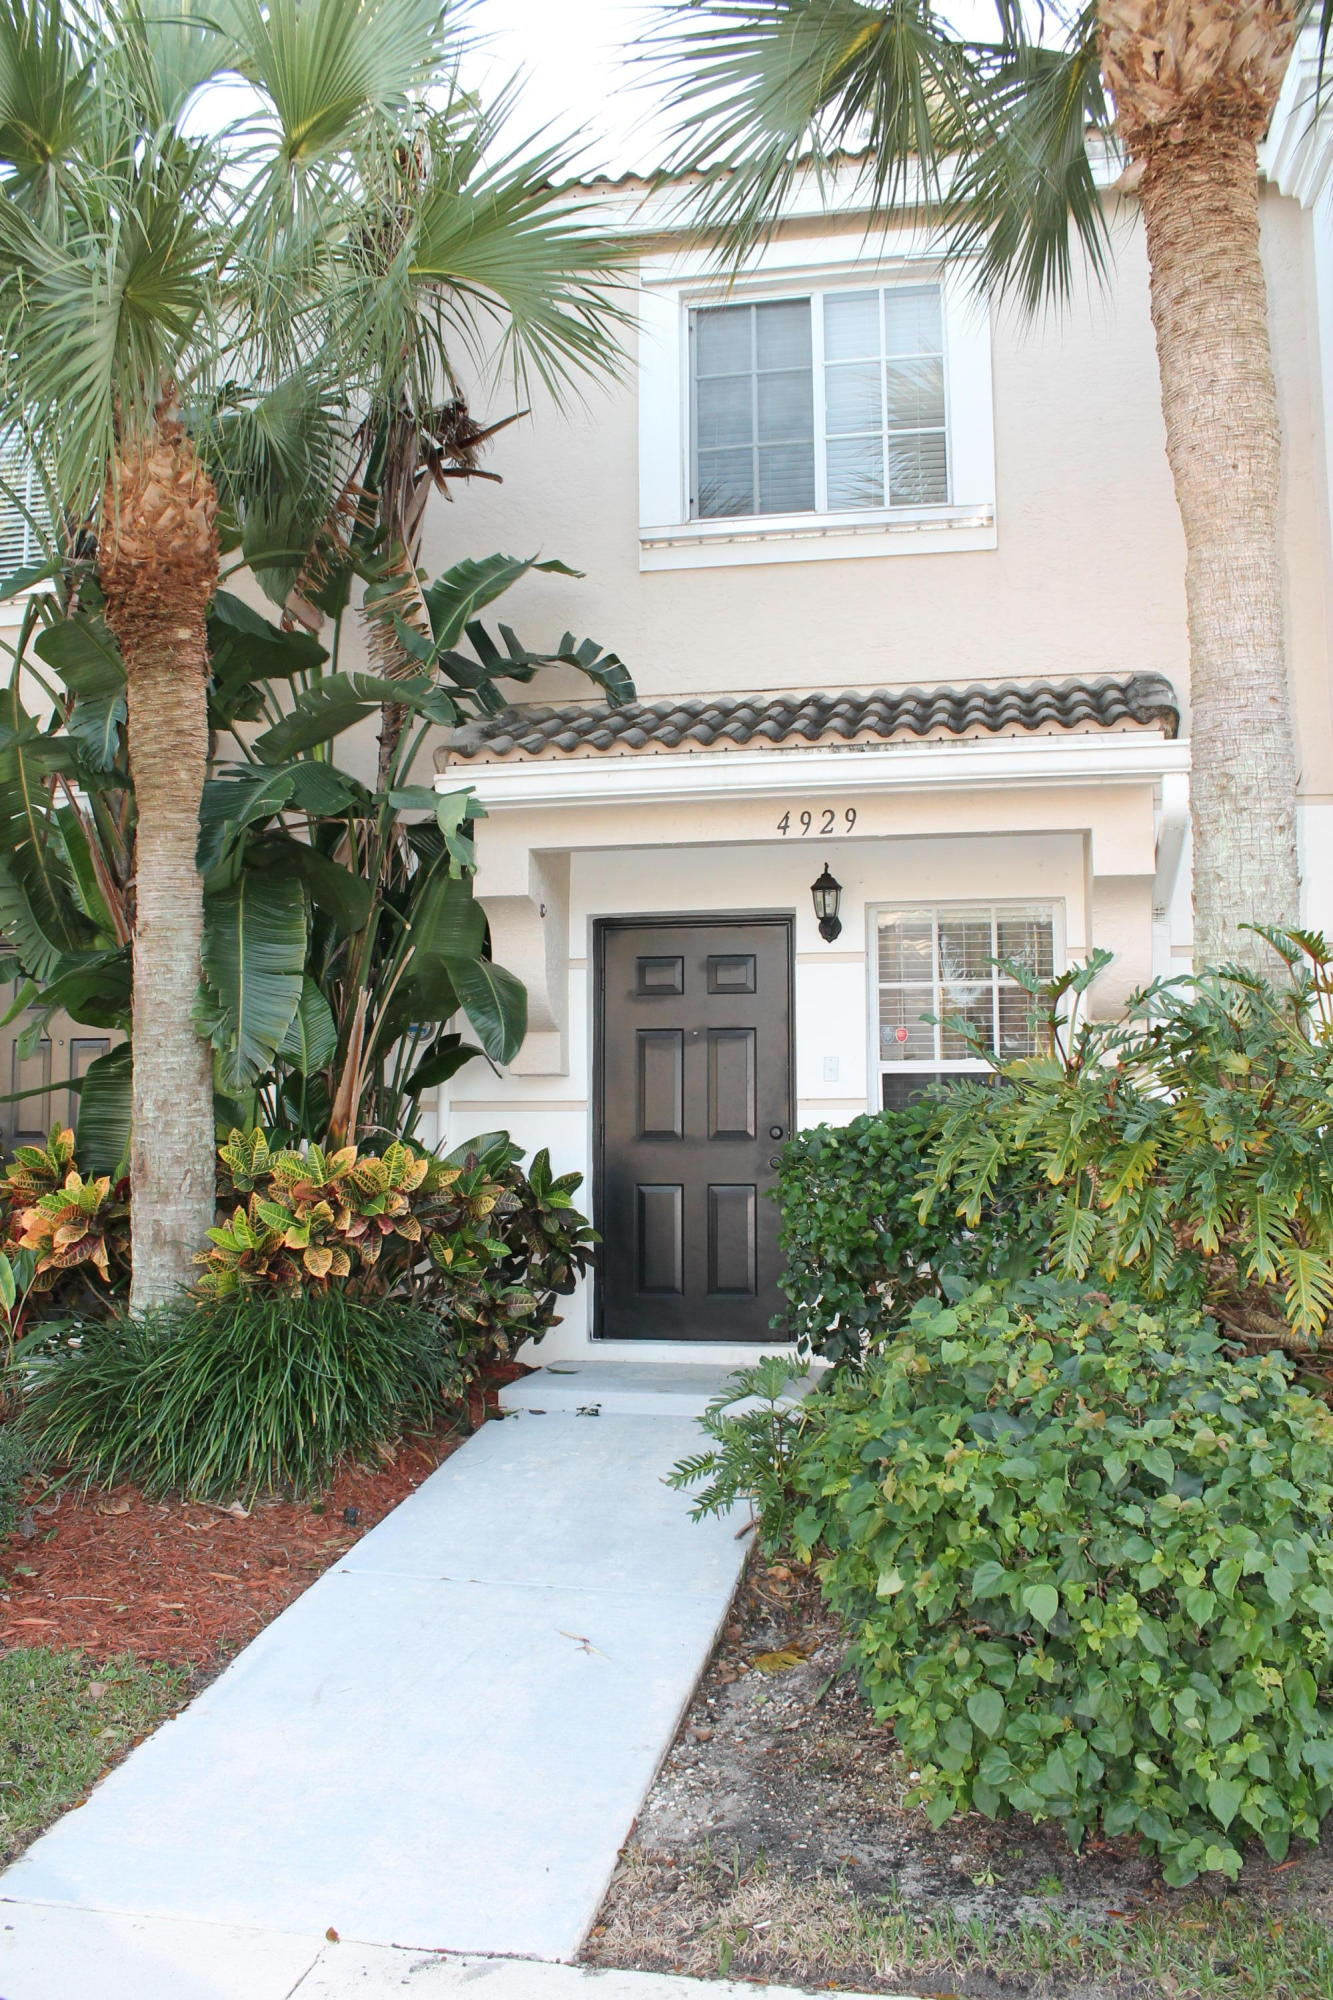 4929 Palmbrooke Circle West Palm Beach, FL 33417